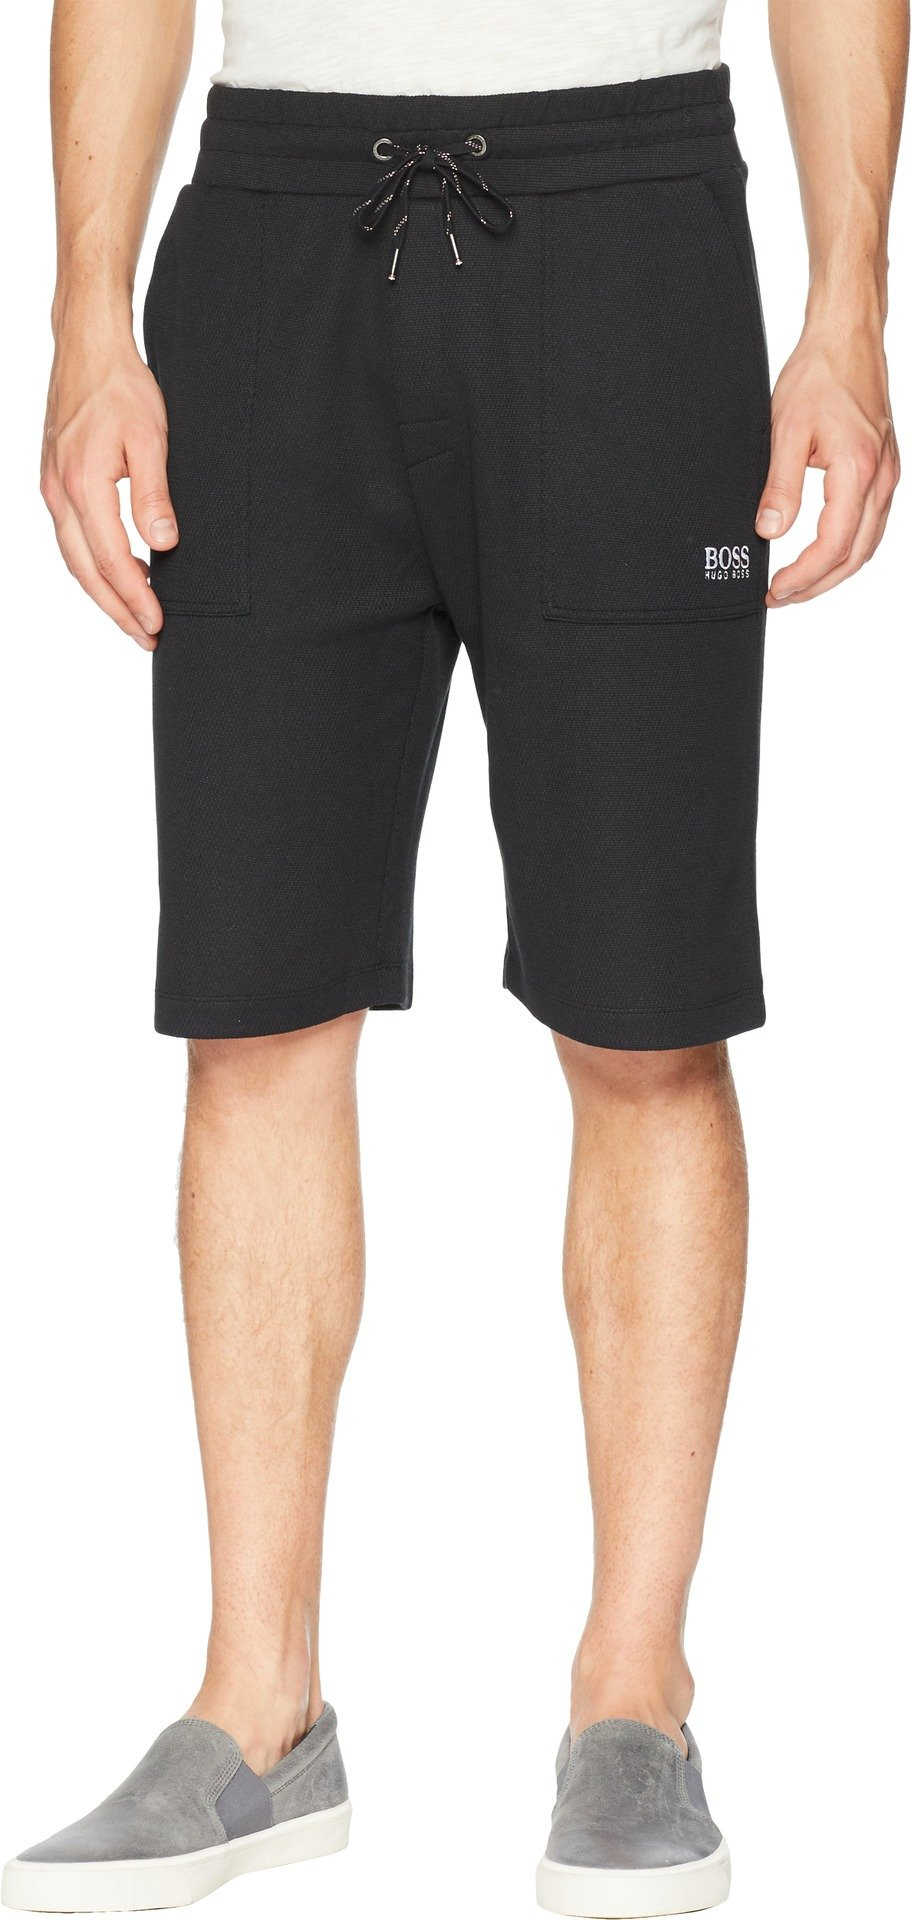 Hugo Boss BOSS Men's Contemporary Shorts Black Large